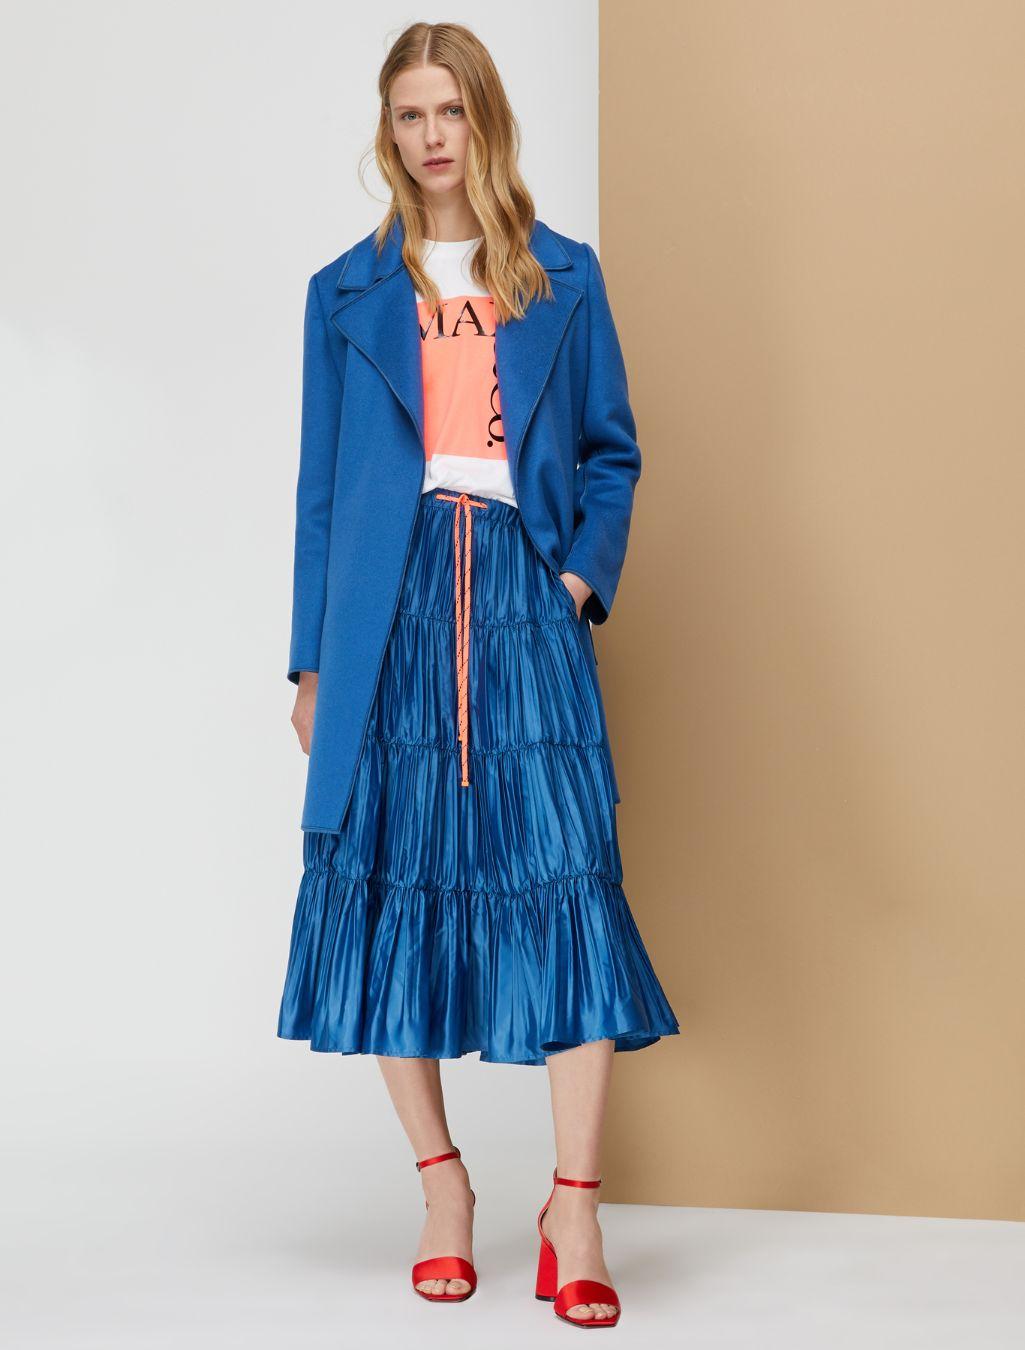 DATABILE Skirt china clue 4